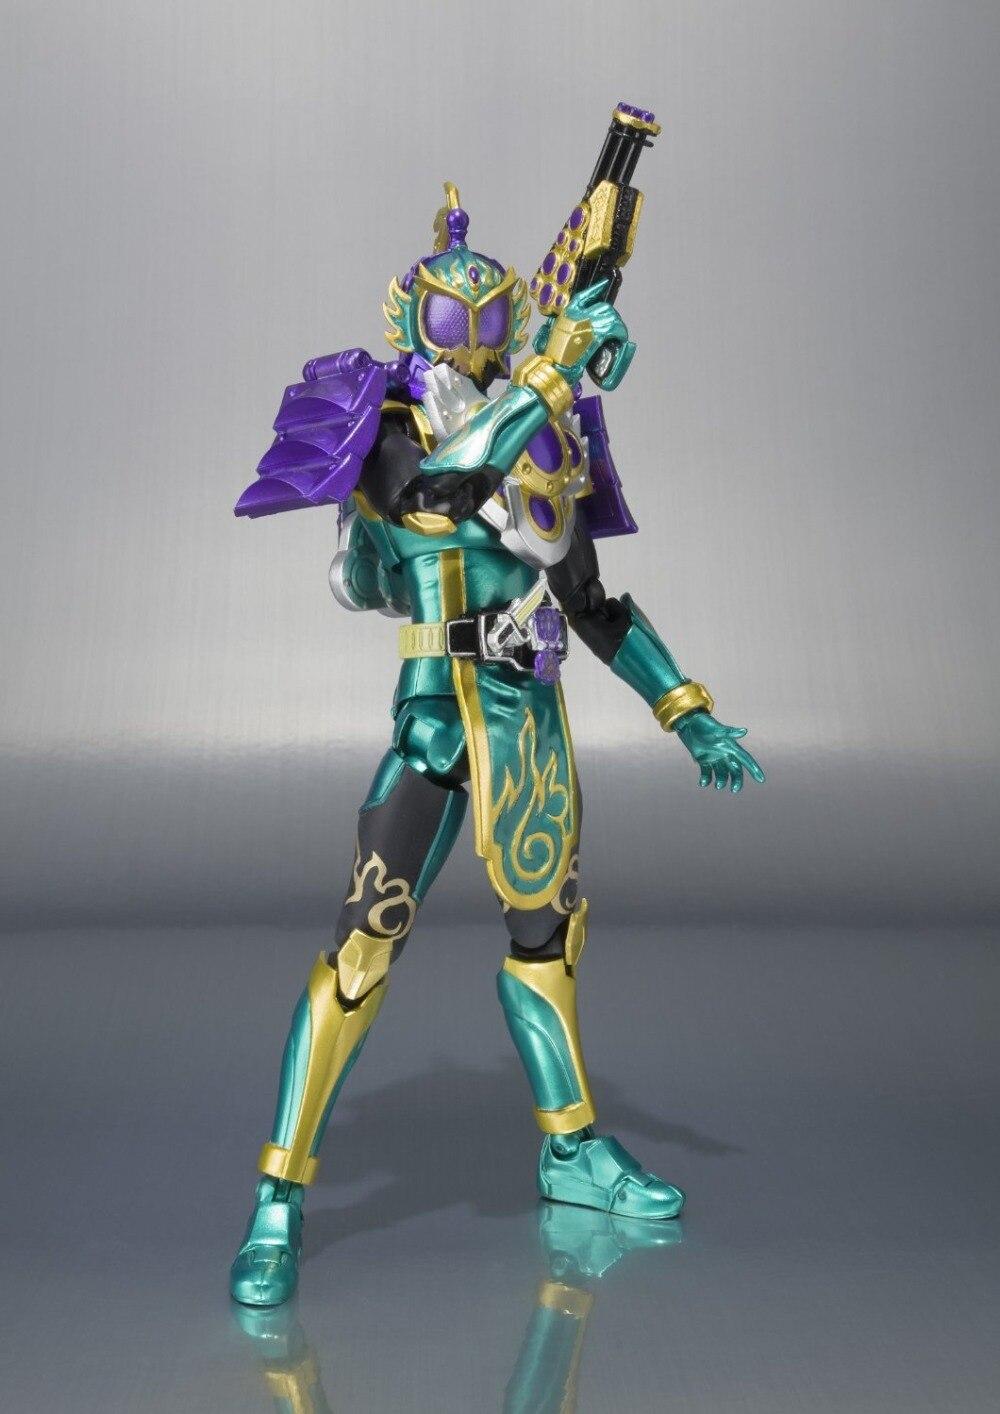 100% Original BANDAI Tamashii Nations S.H.Figuarts (SHF) Action Figure - Kamen Rider Ryugen Budou Arms from Kamen Rider Gaim